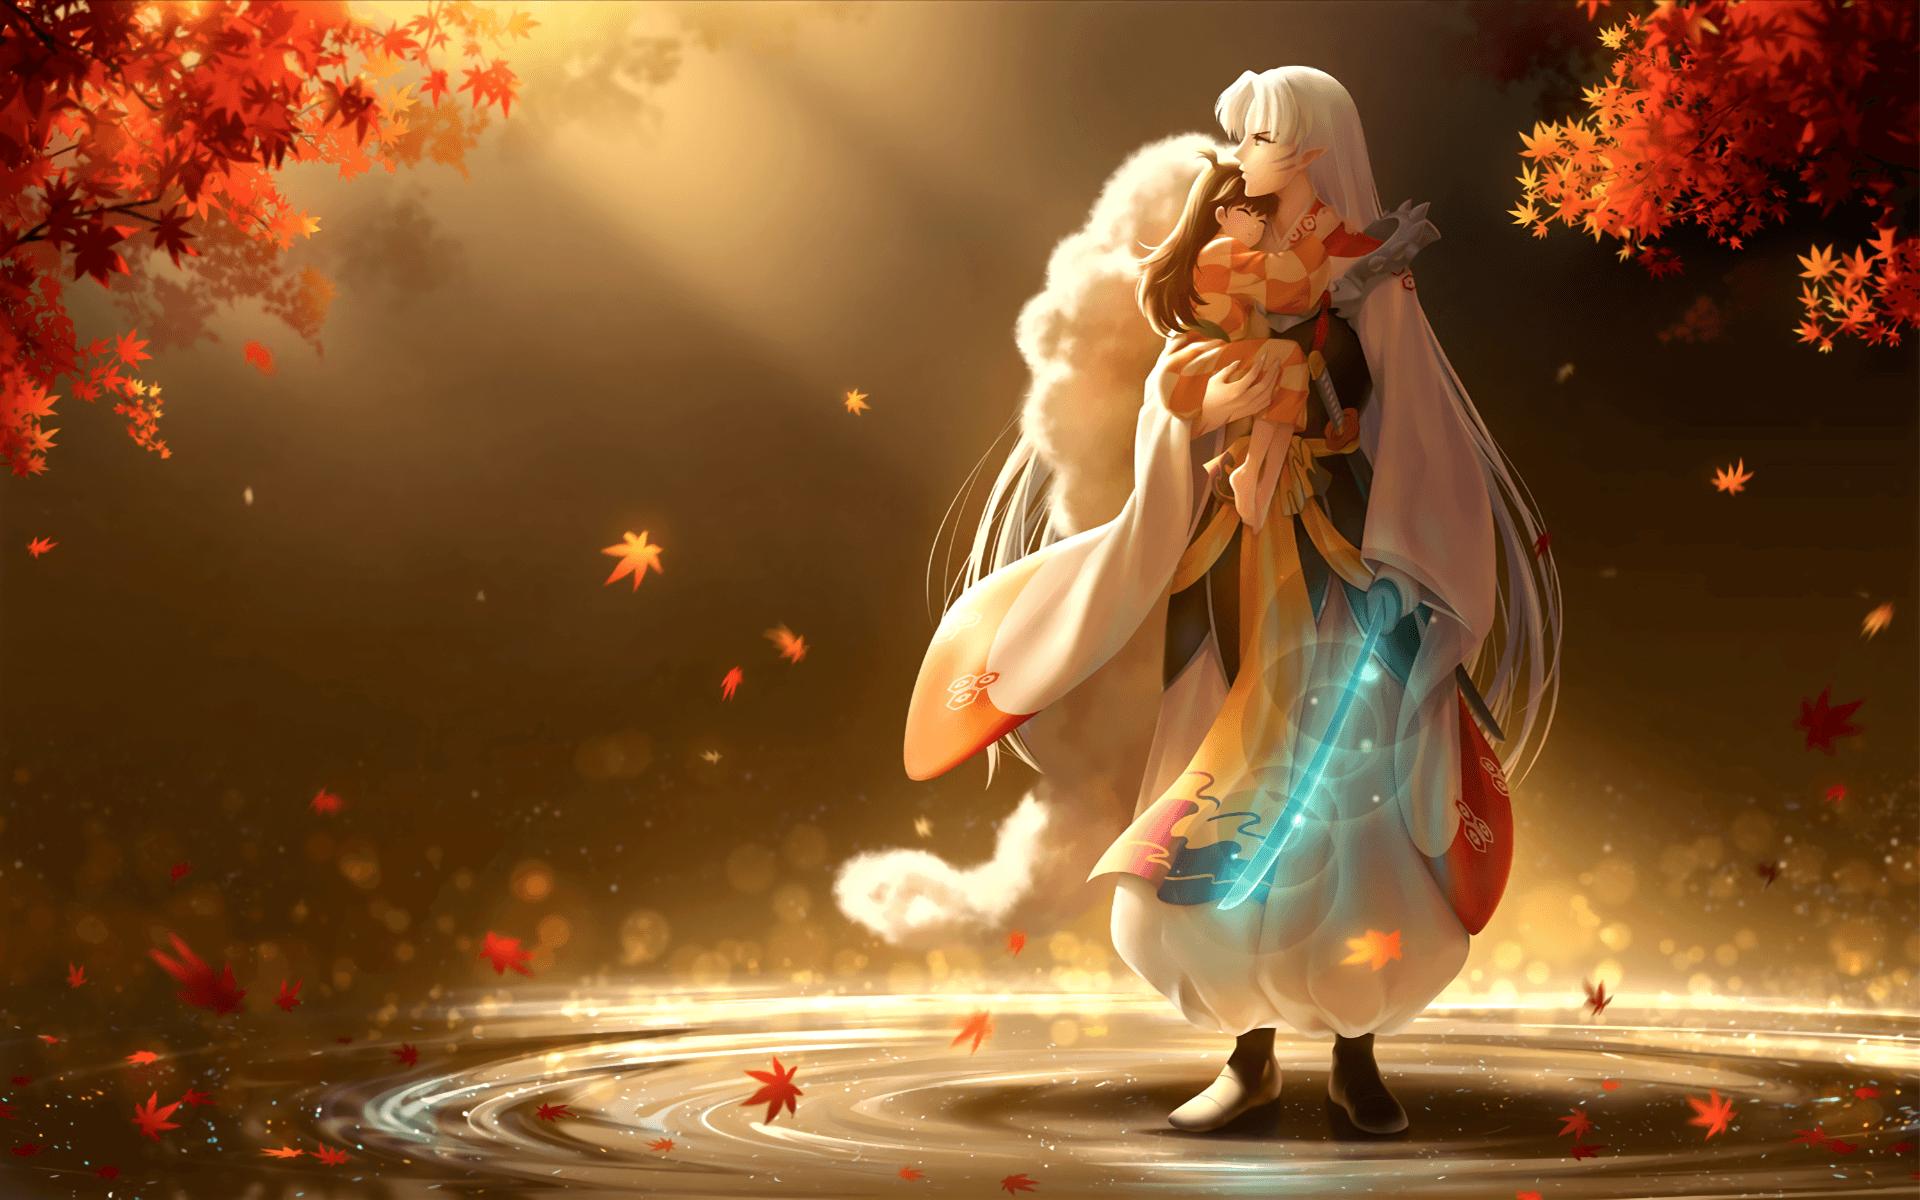 Inuyasha Wallpapers Top Free Inuyasha Backgrounds